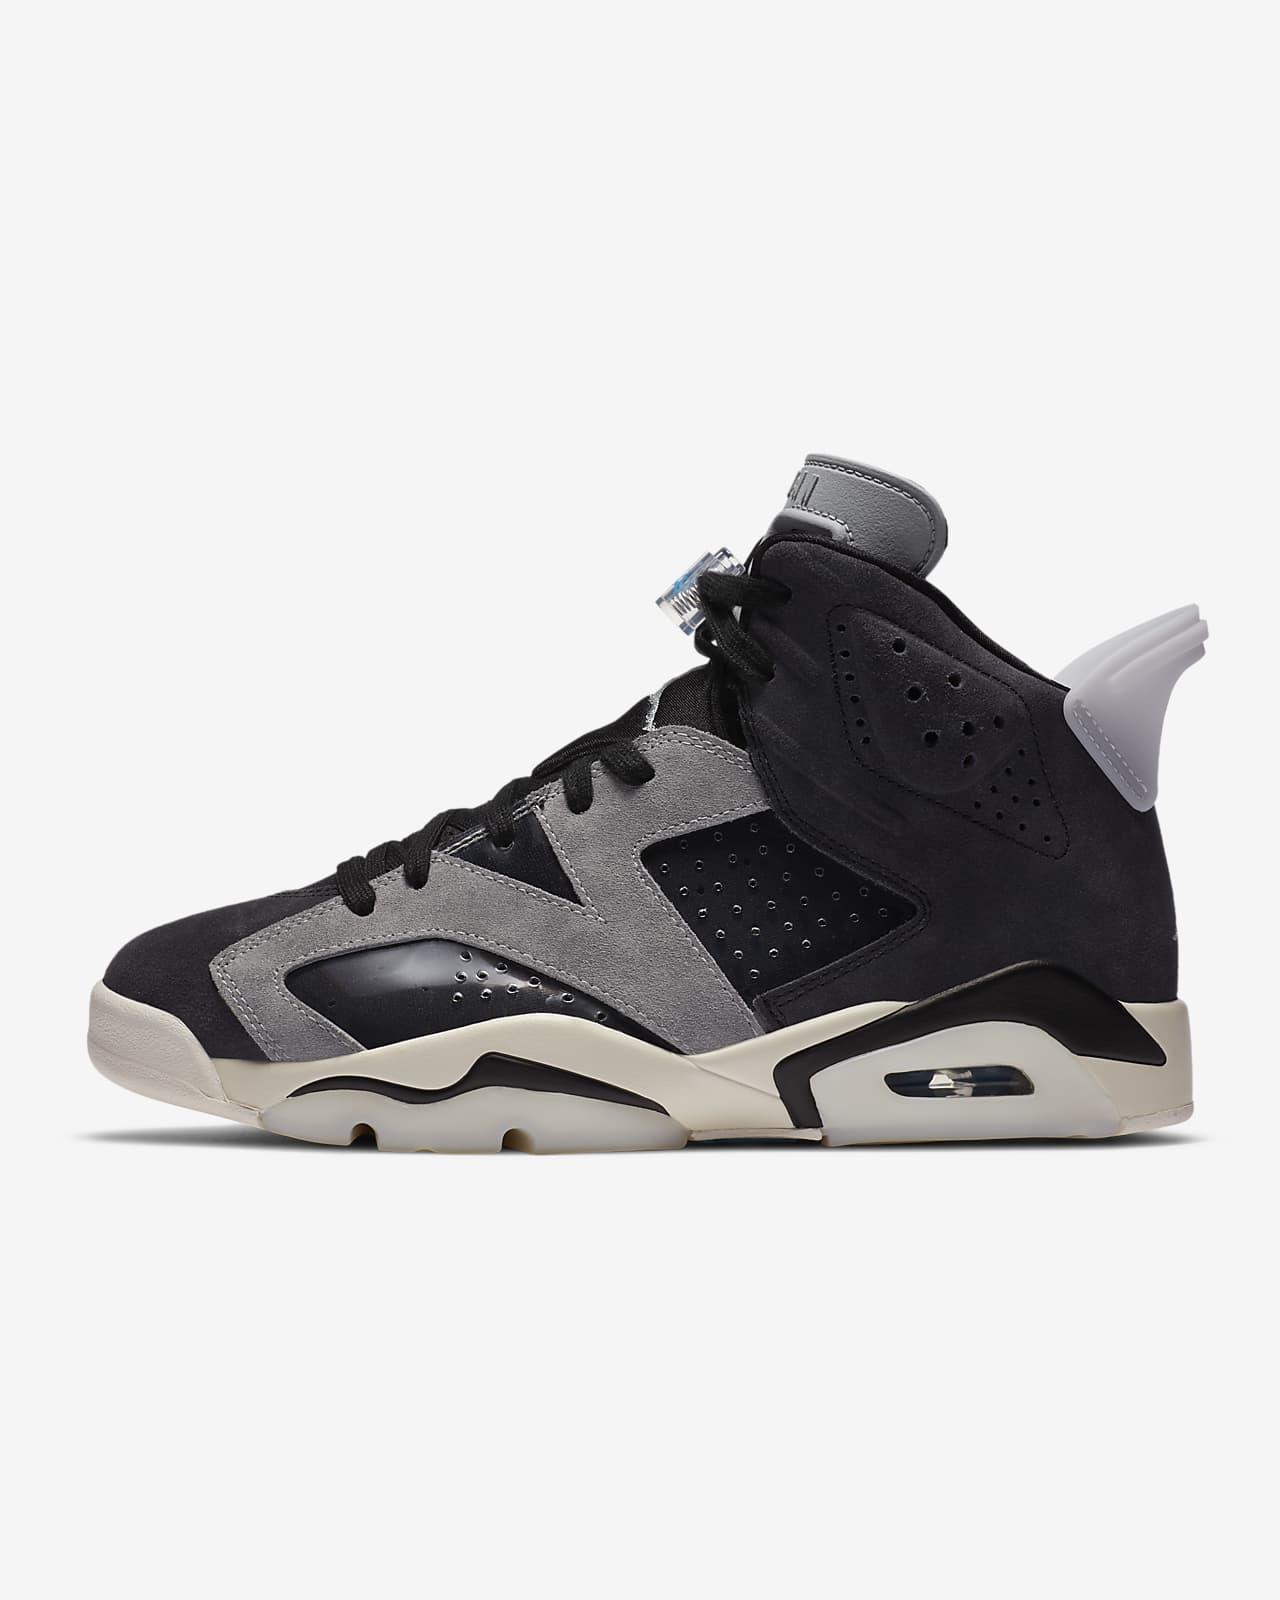 Air Jordan 6 Retro 复刻女子运动鞋